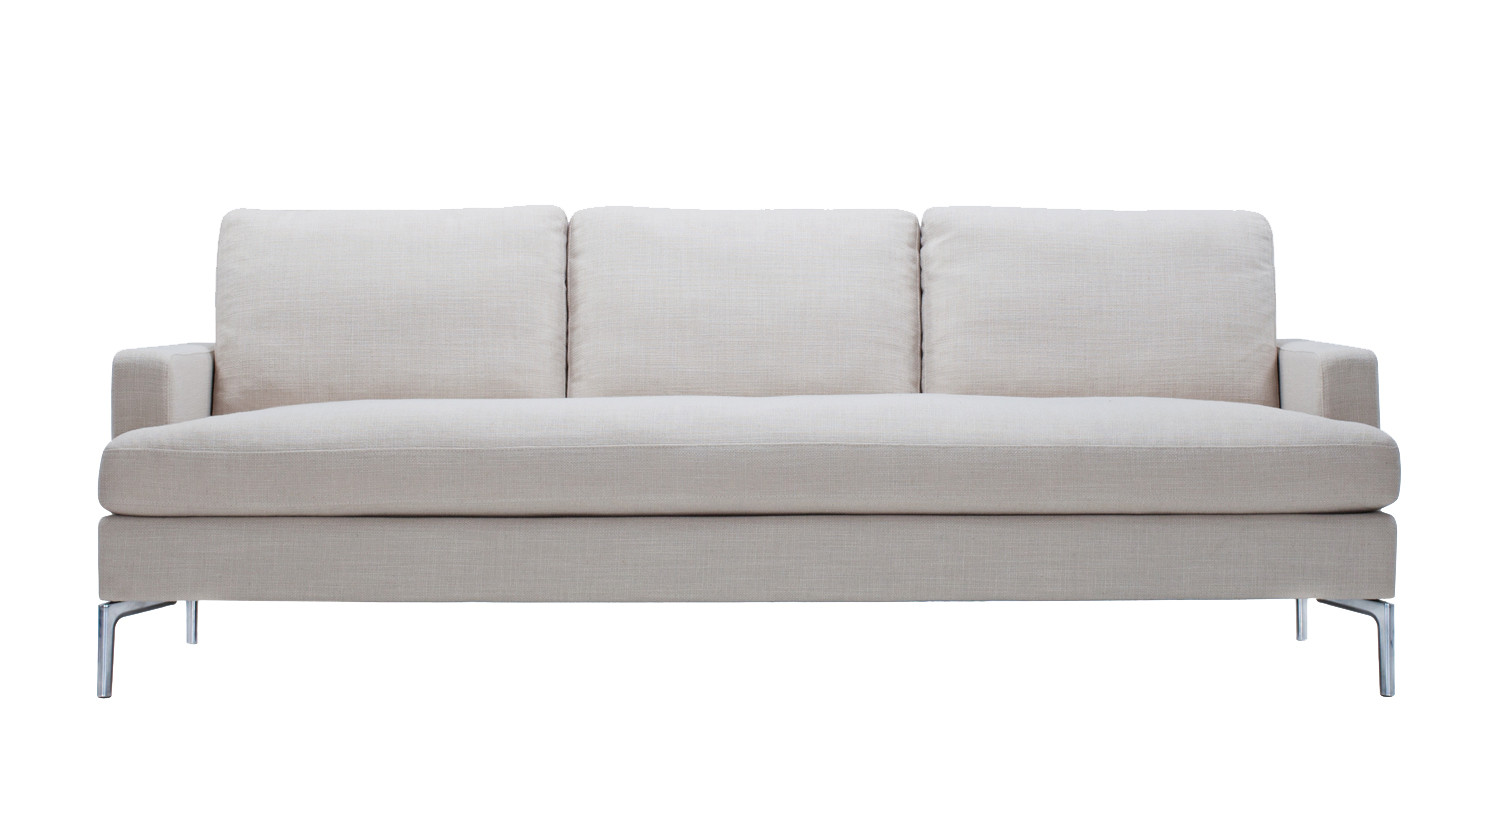 sleeper-sofa-austin-tx-photo-15